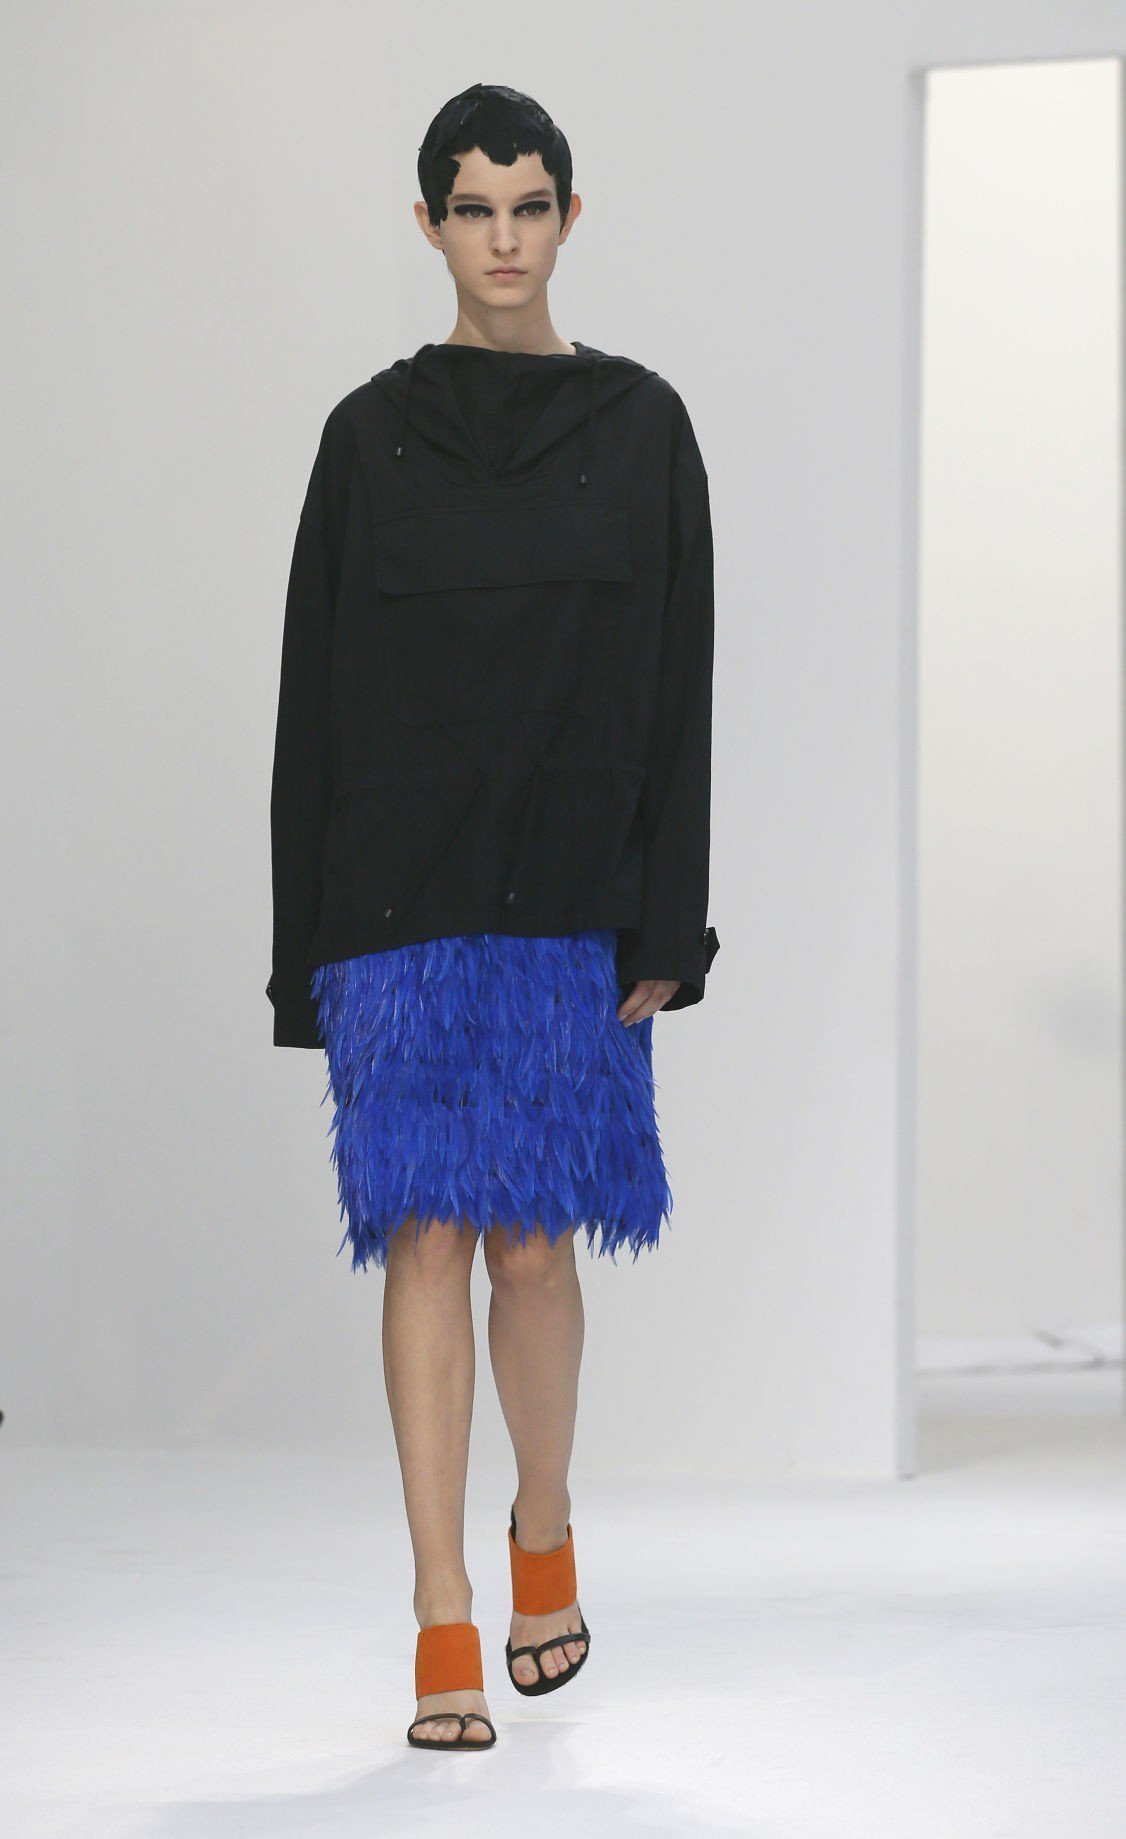 Dries Van Noten帶來一個明亮又繽紛的系列,鮮豔色彩貫穿全場,羽毛、...